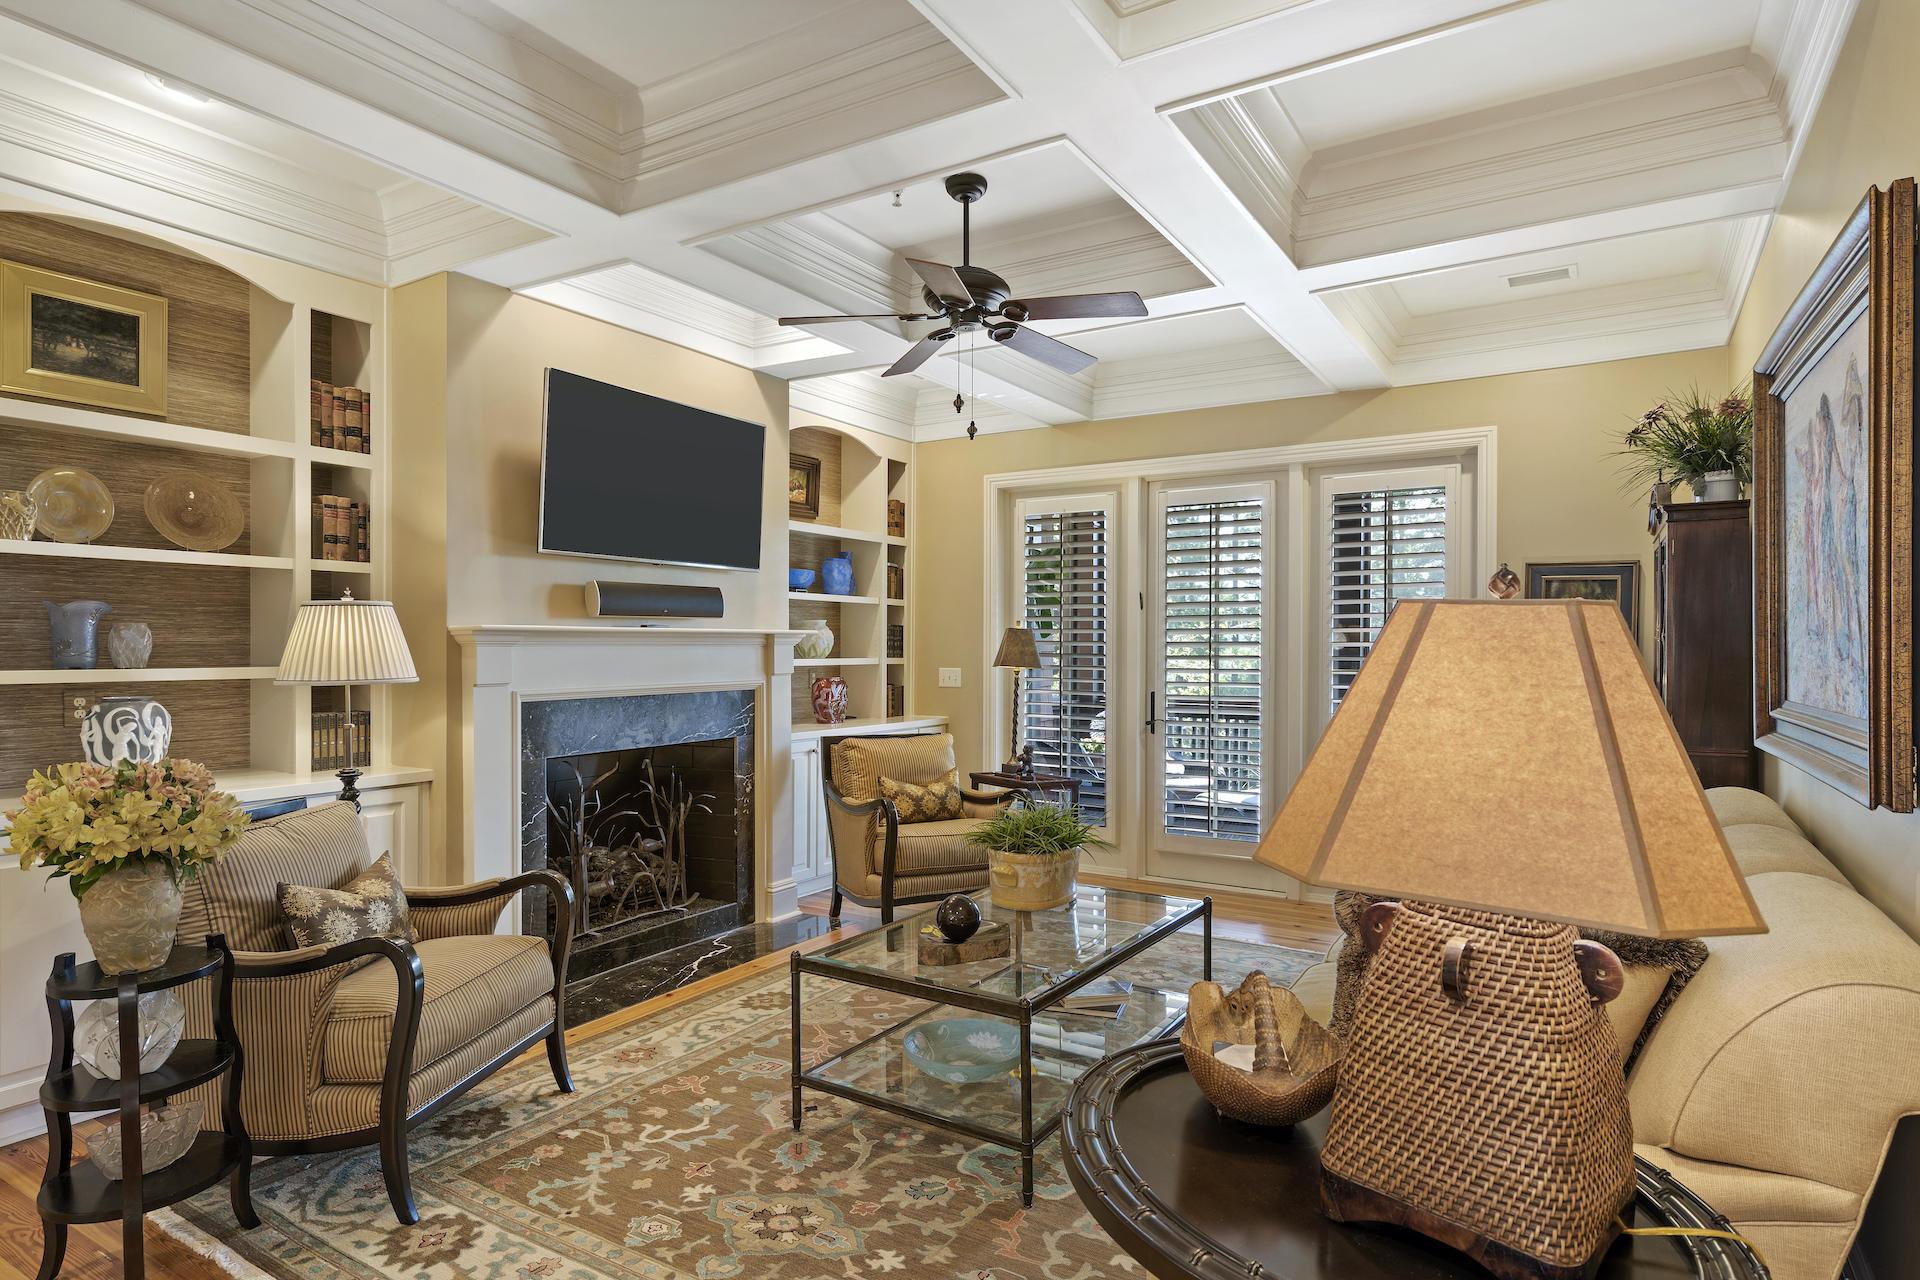 Daniel Island Homes For Sale - 250 Island Park, Charleston, SC - 10